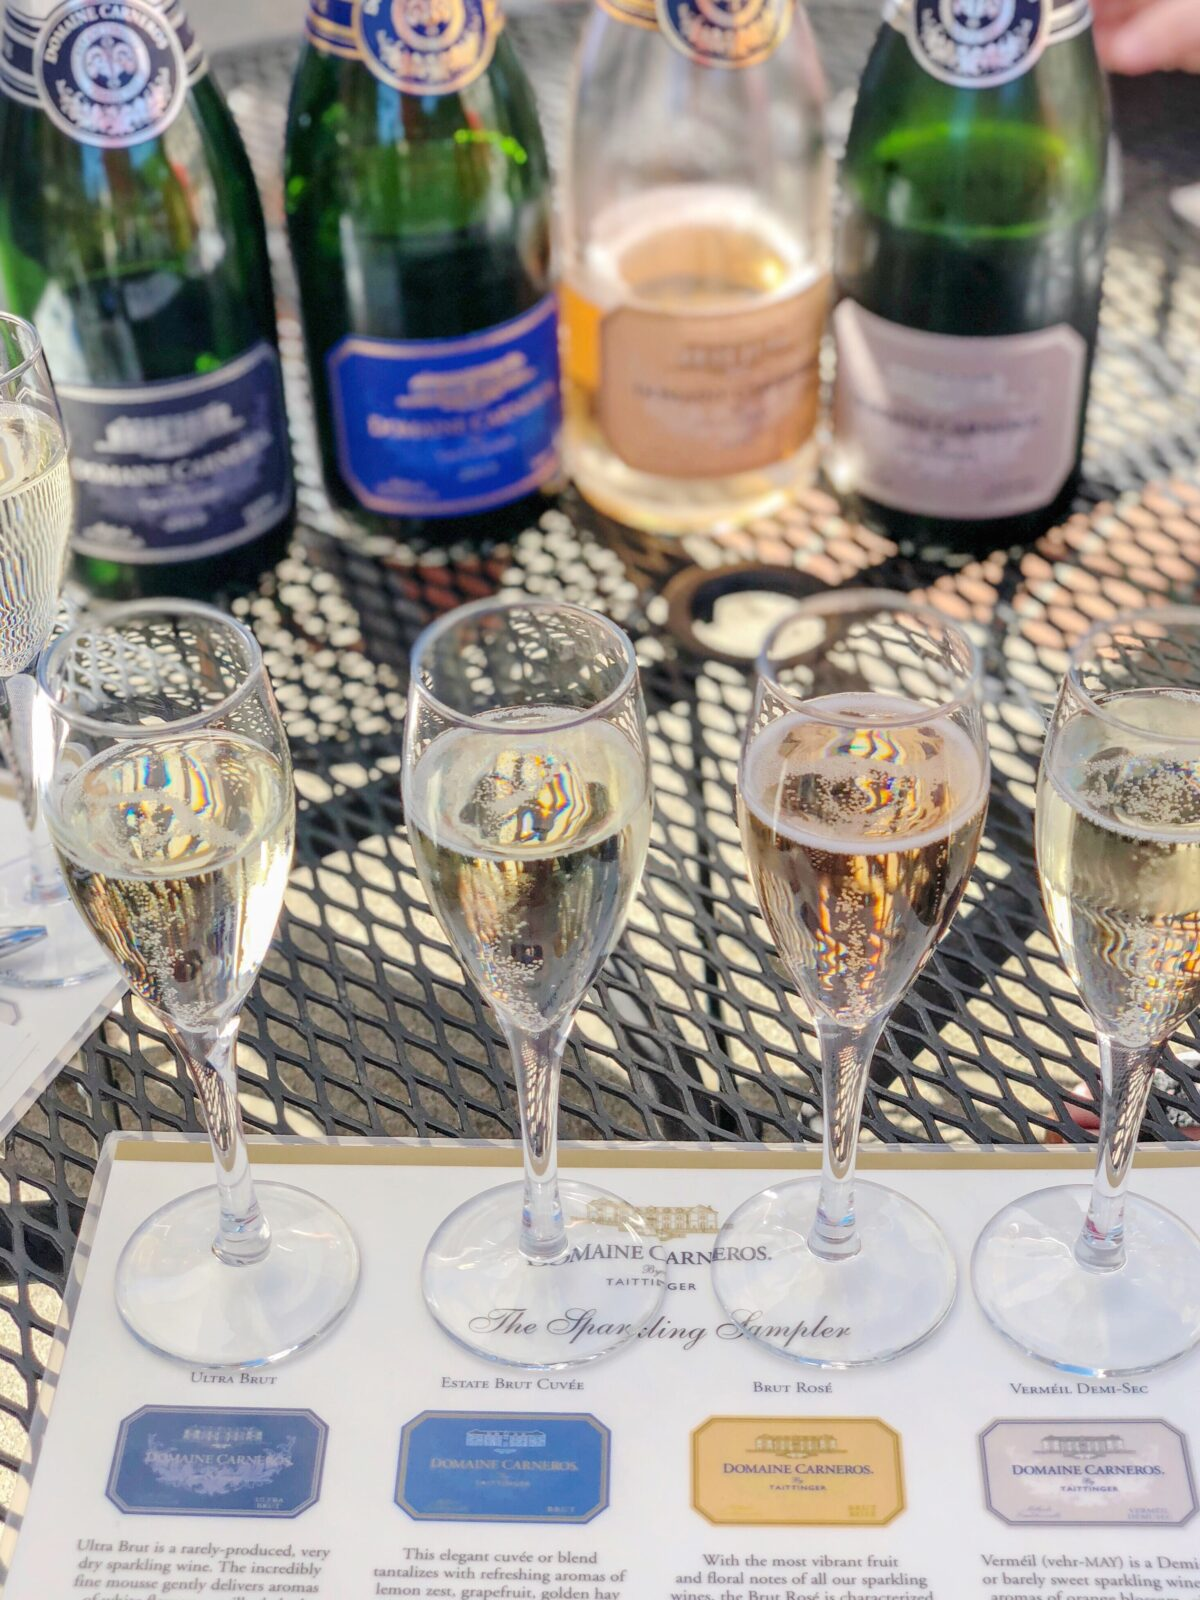 Domaine Carneros Sparkling Wine Tasting Flight